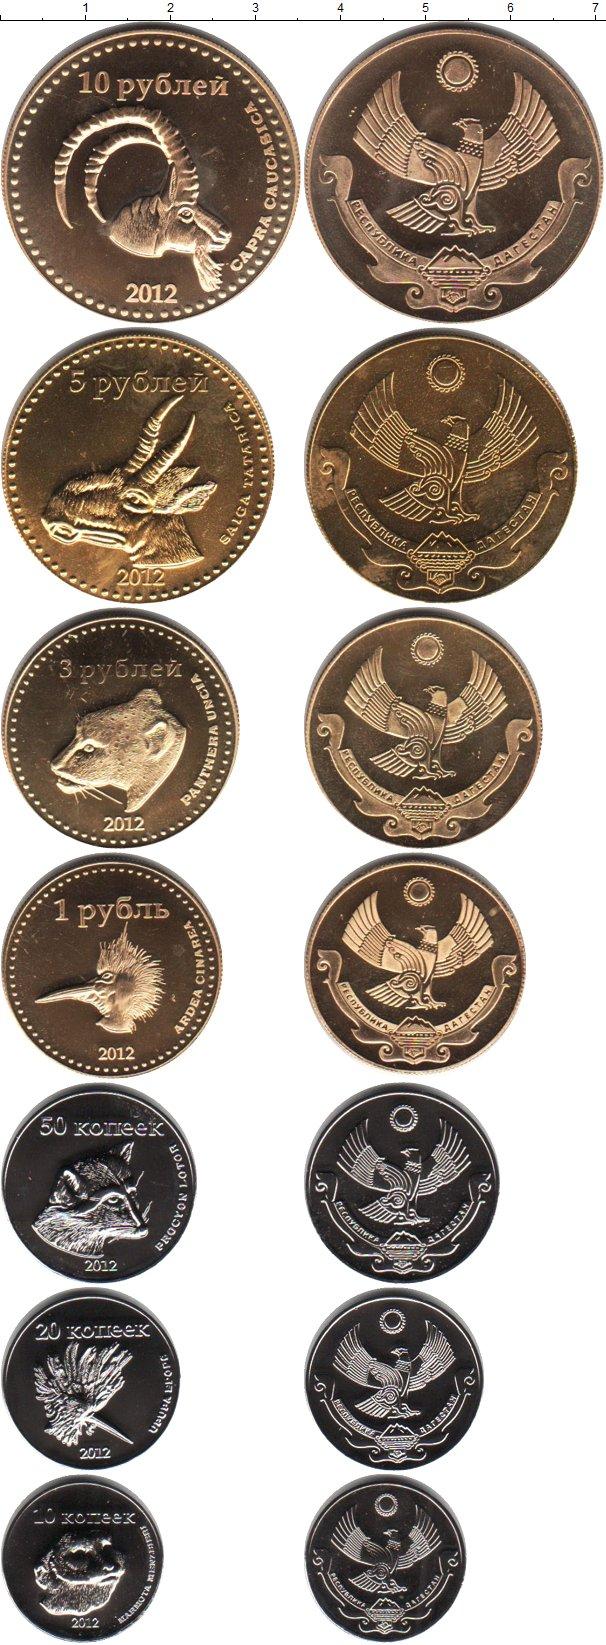 Картинка Наборы монет Дагестан Россия 2012  2012